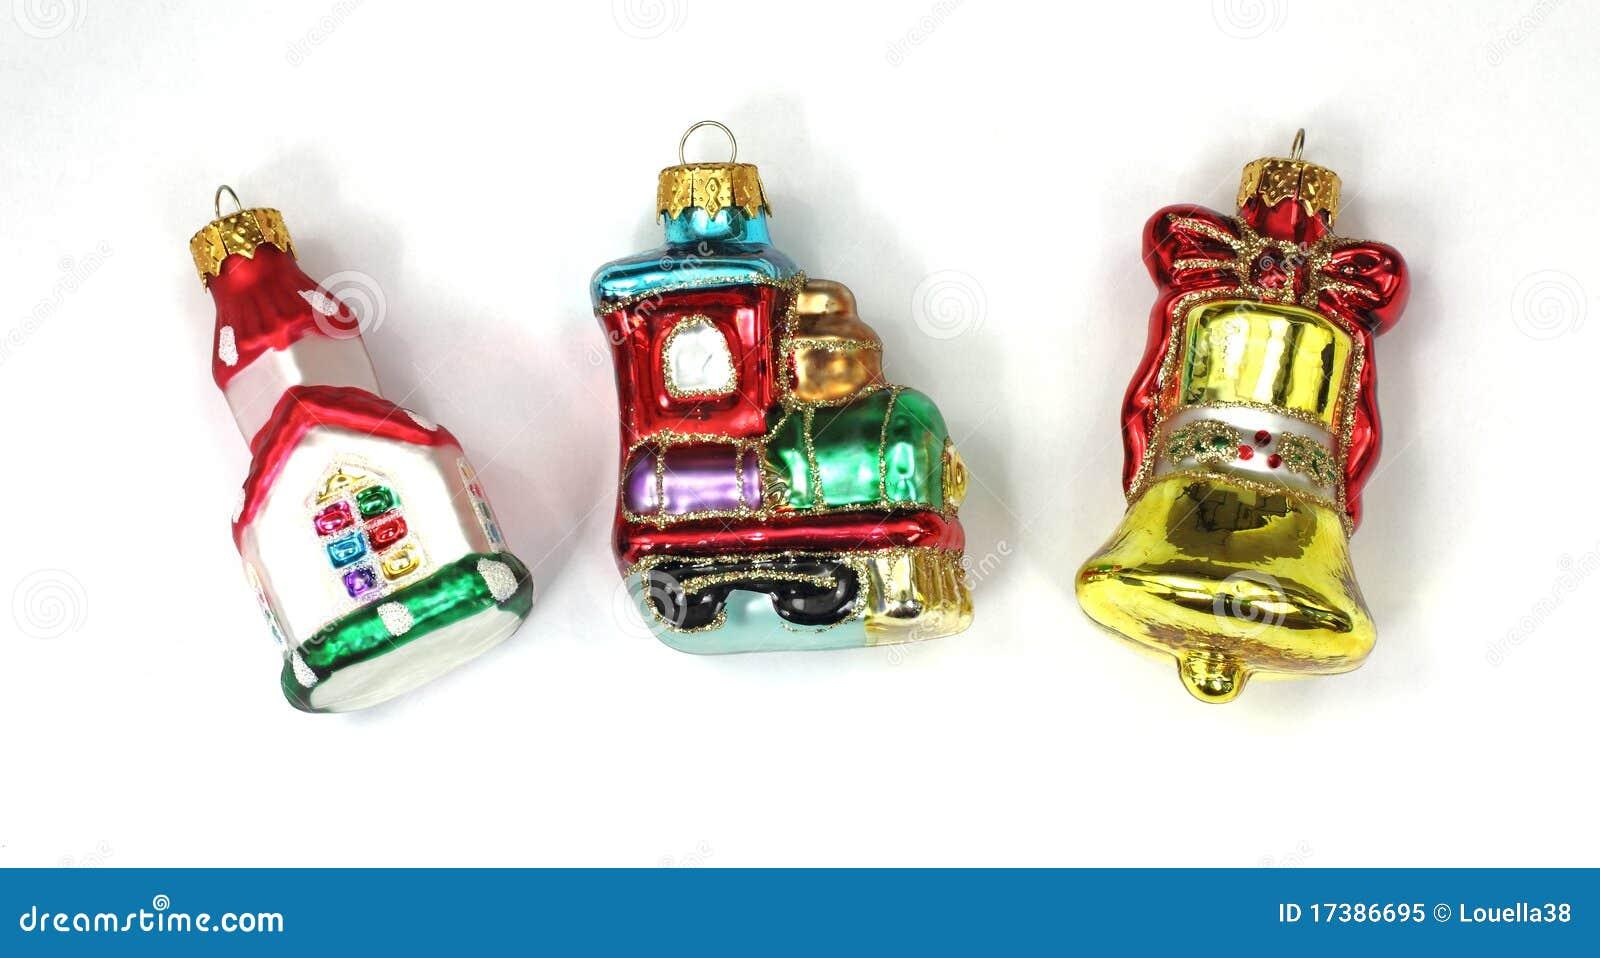 Miniature ornaments - Church Train Bell Miniature Ornaments